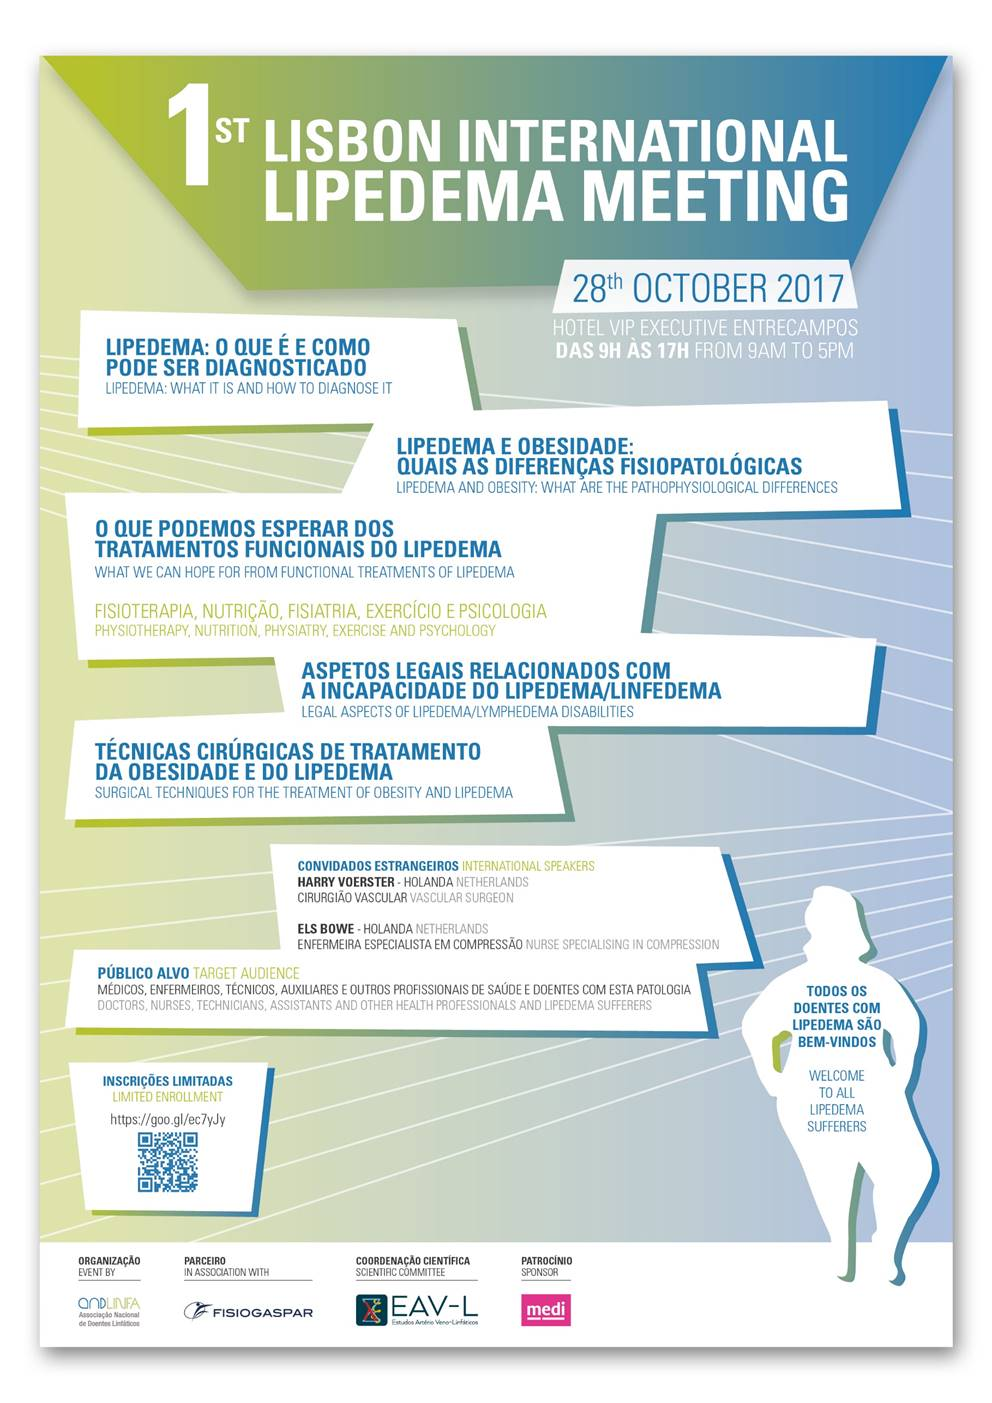 Lisbon lipedema meeting